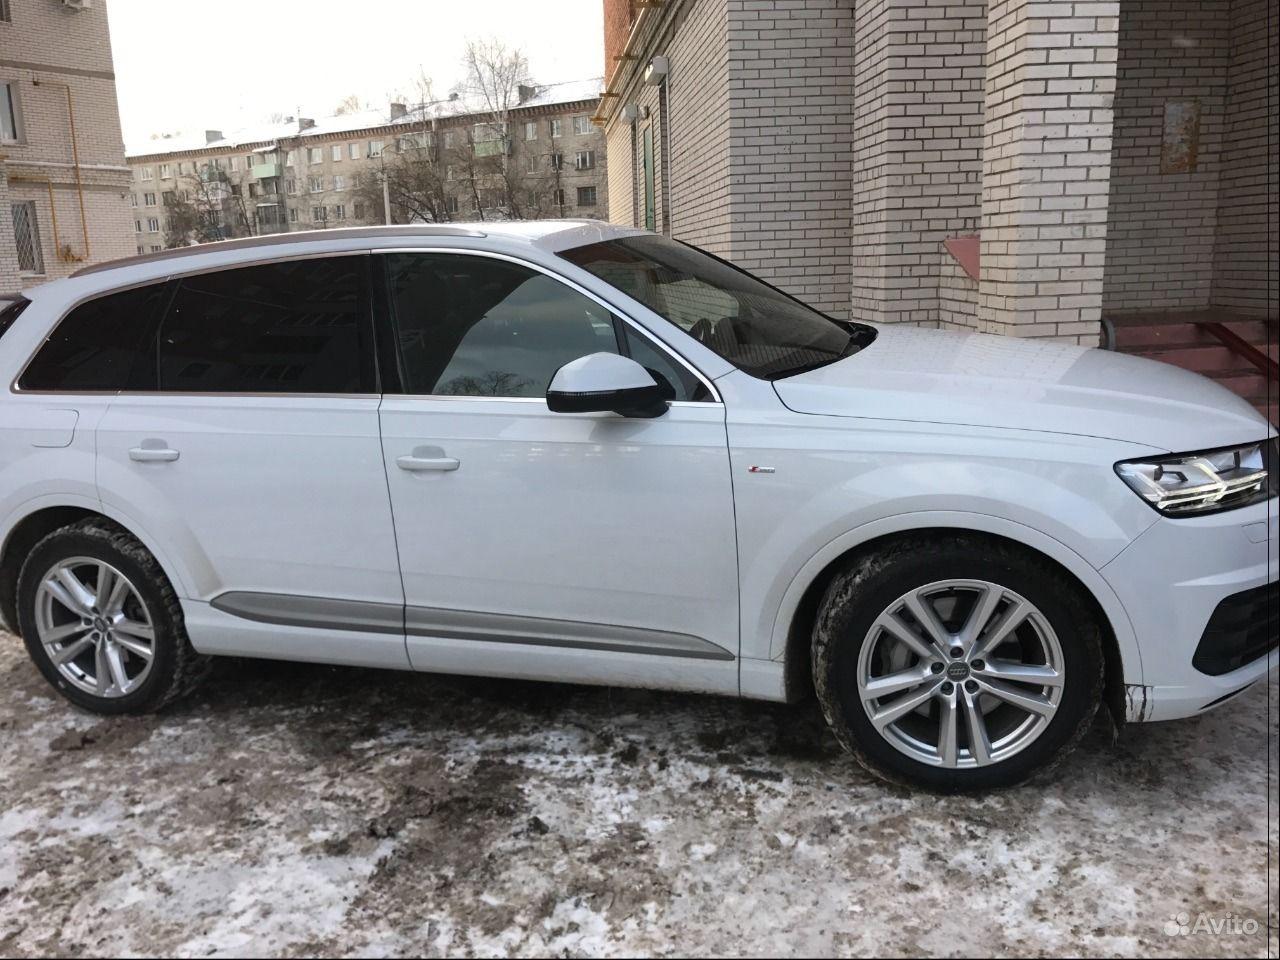 Audi Q7, 2015 — фотография №7